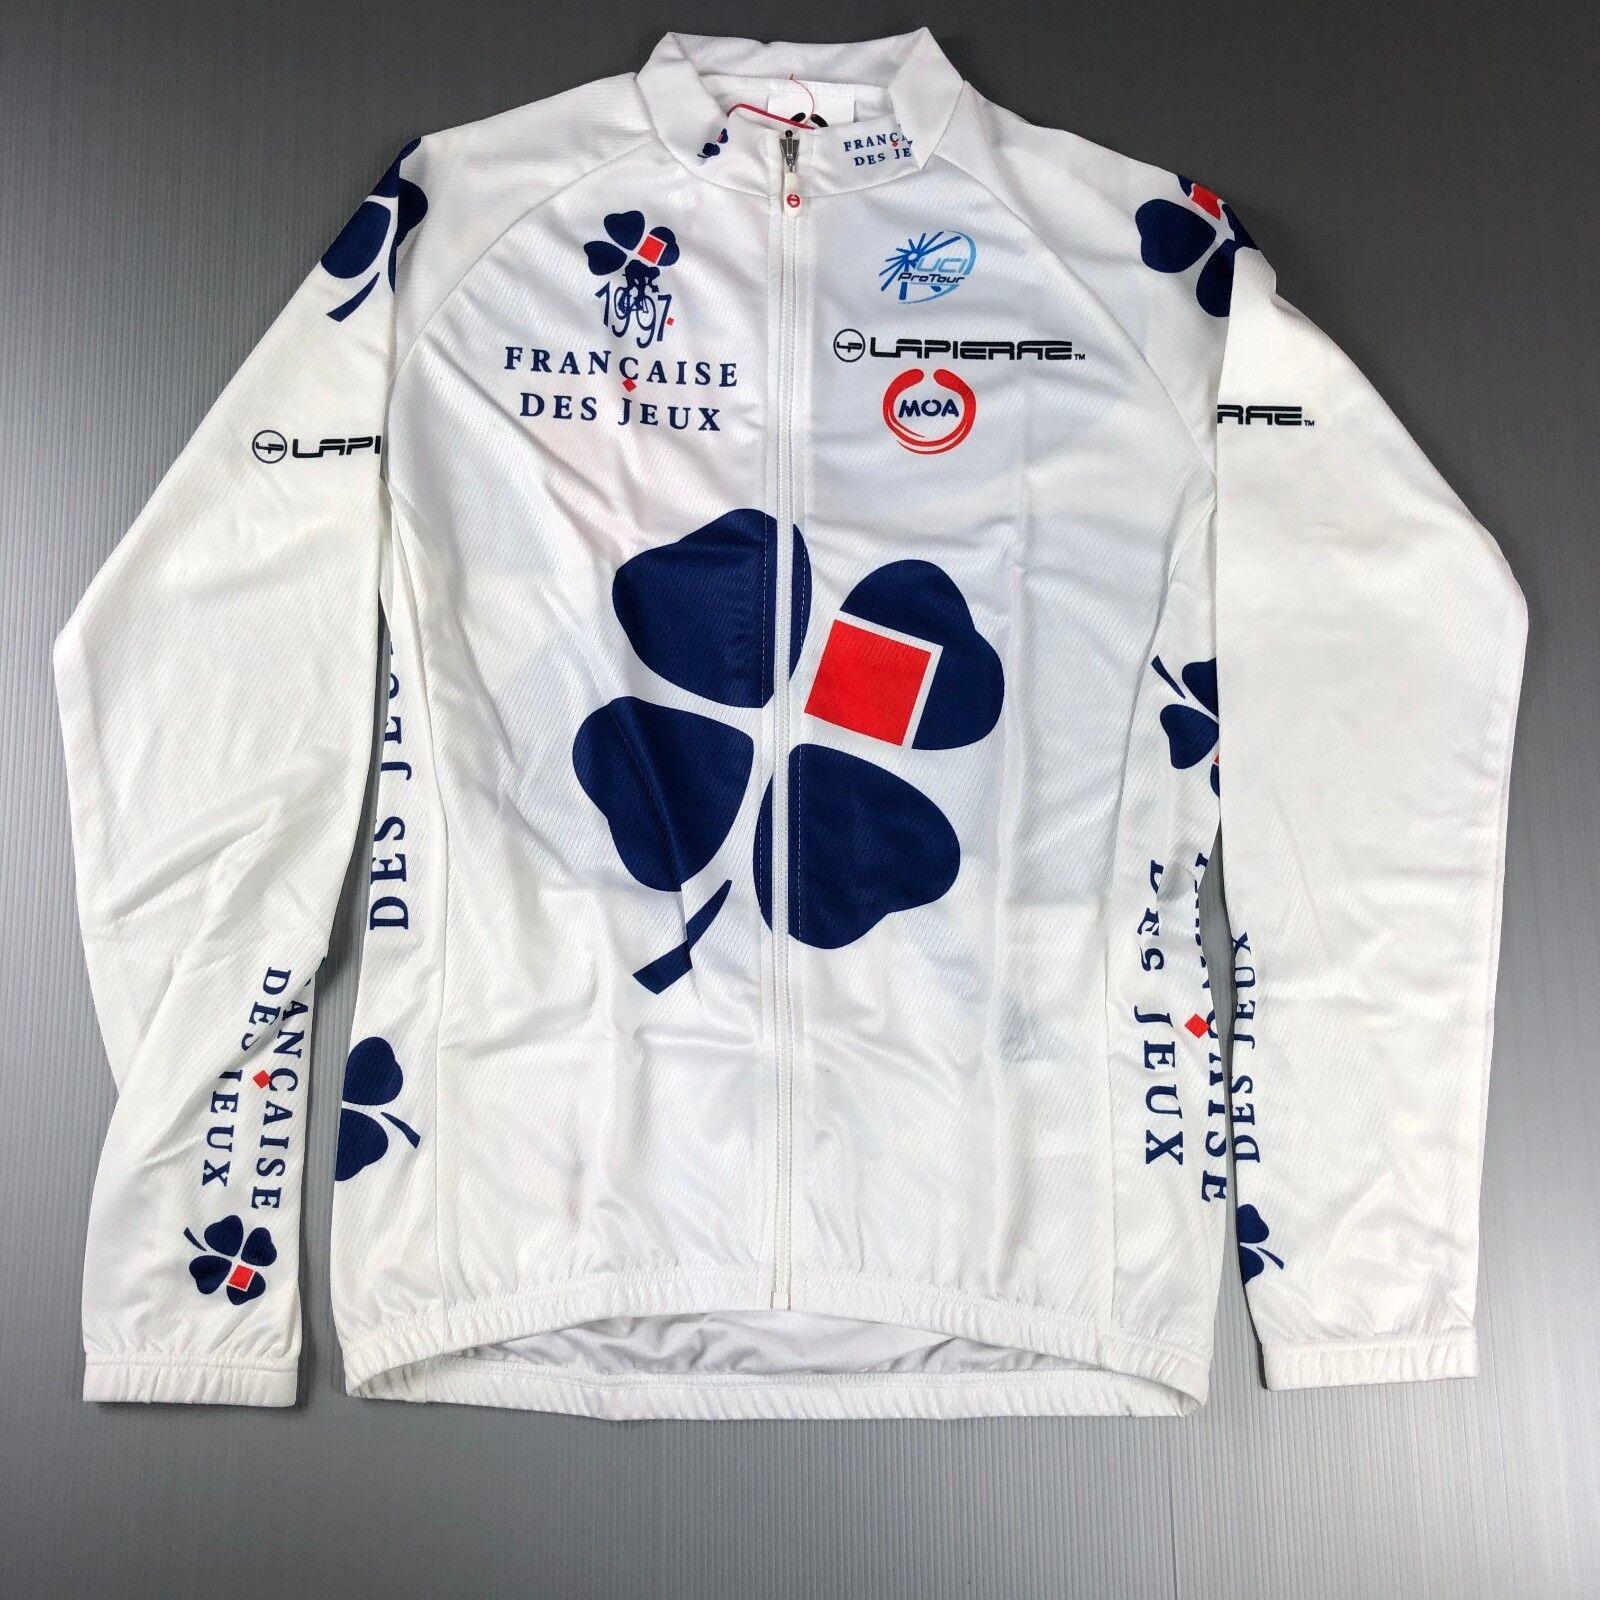 Francaise de yeux original nalini moa Radfahren long sleeved tailGoldt jersey jersey l